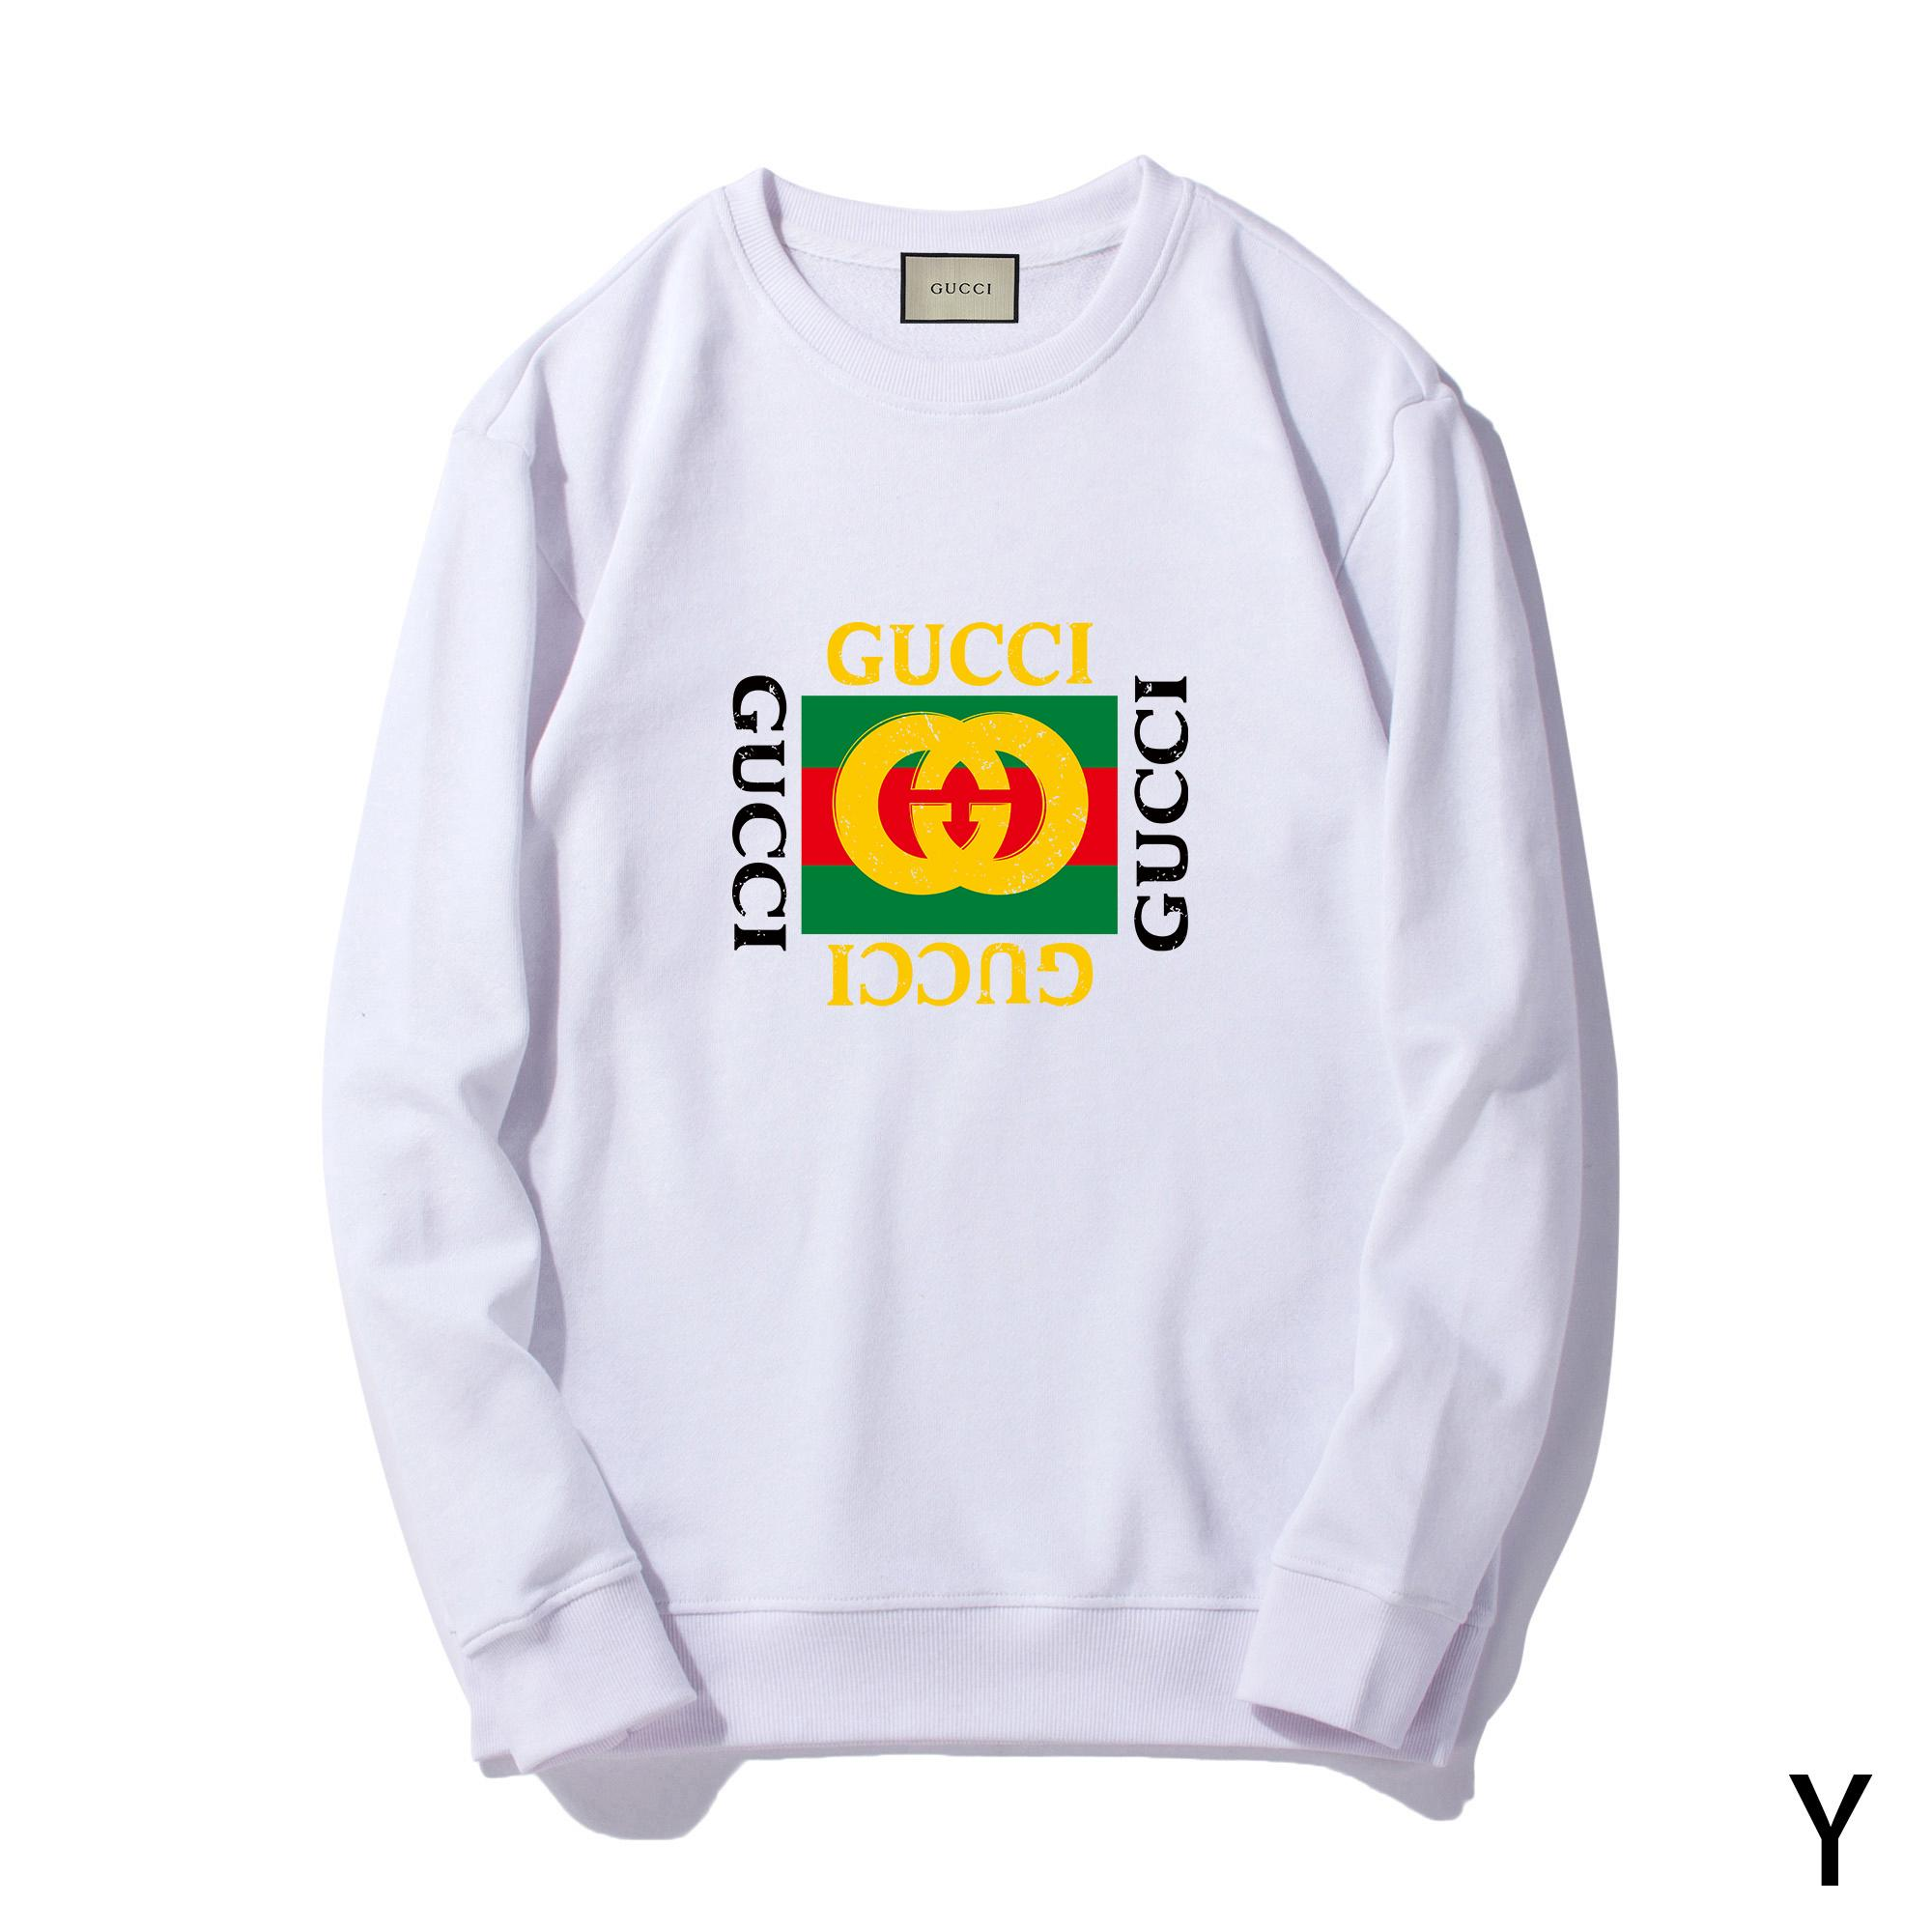 b1401720c New⠀GUCCI Fashion⠀LV Harajuku Tracksuit Women Long Sleeve Round Neck Hoodie  Jumper Casual Sweatshirt Pullover Tops Coats Crazy T Shirts T Shirt Prints  ...